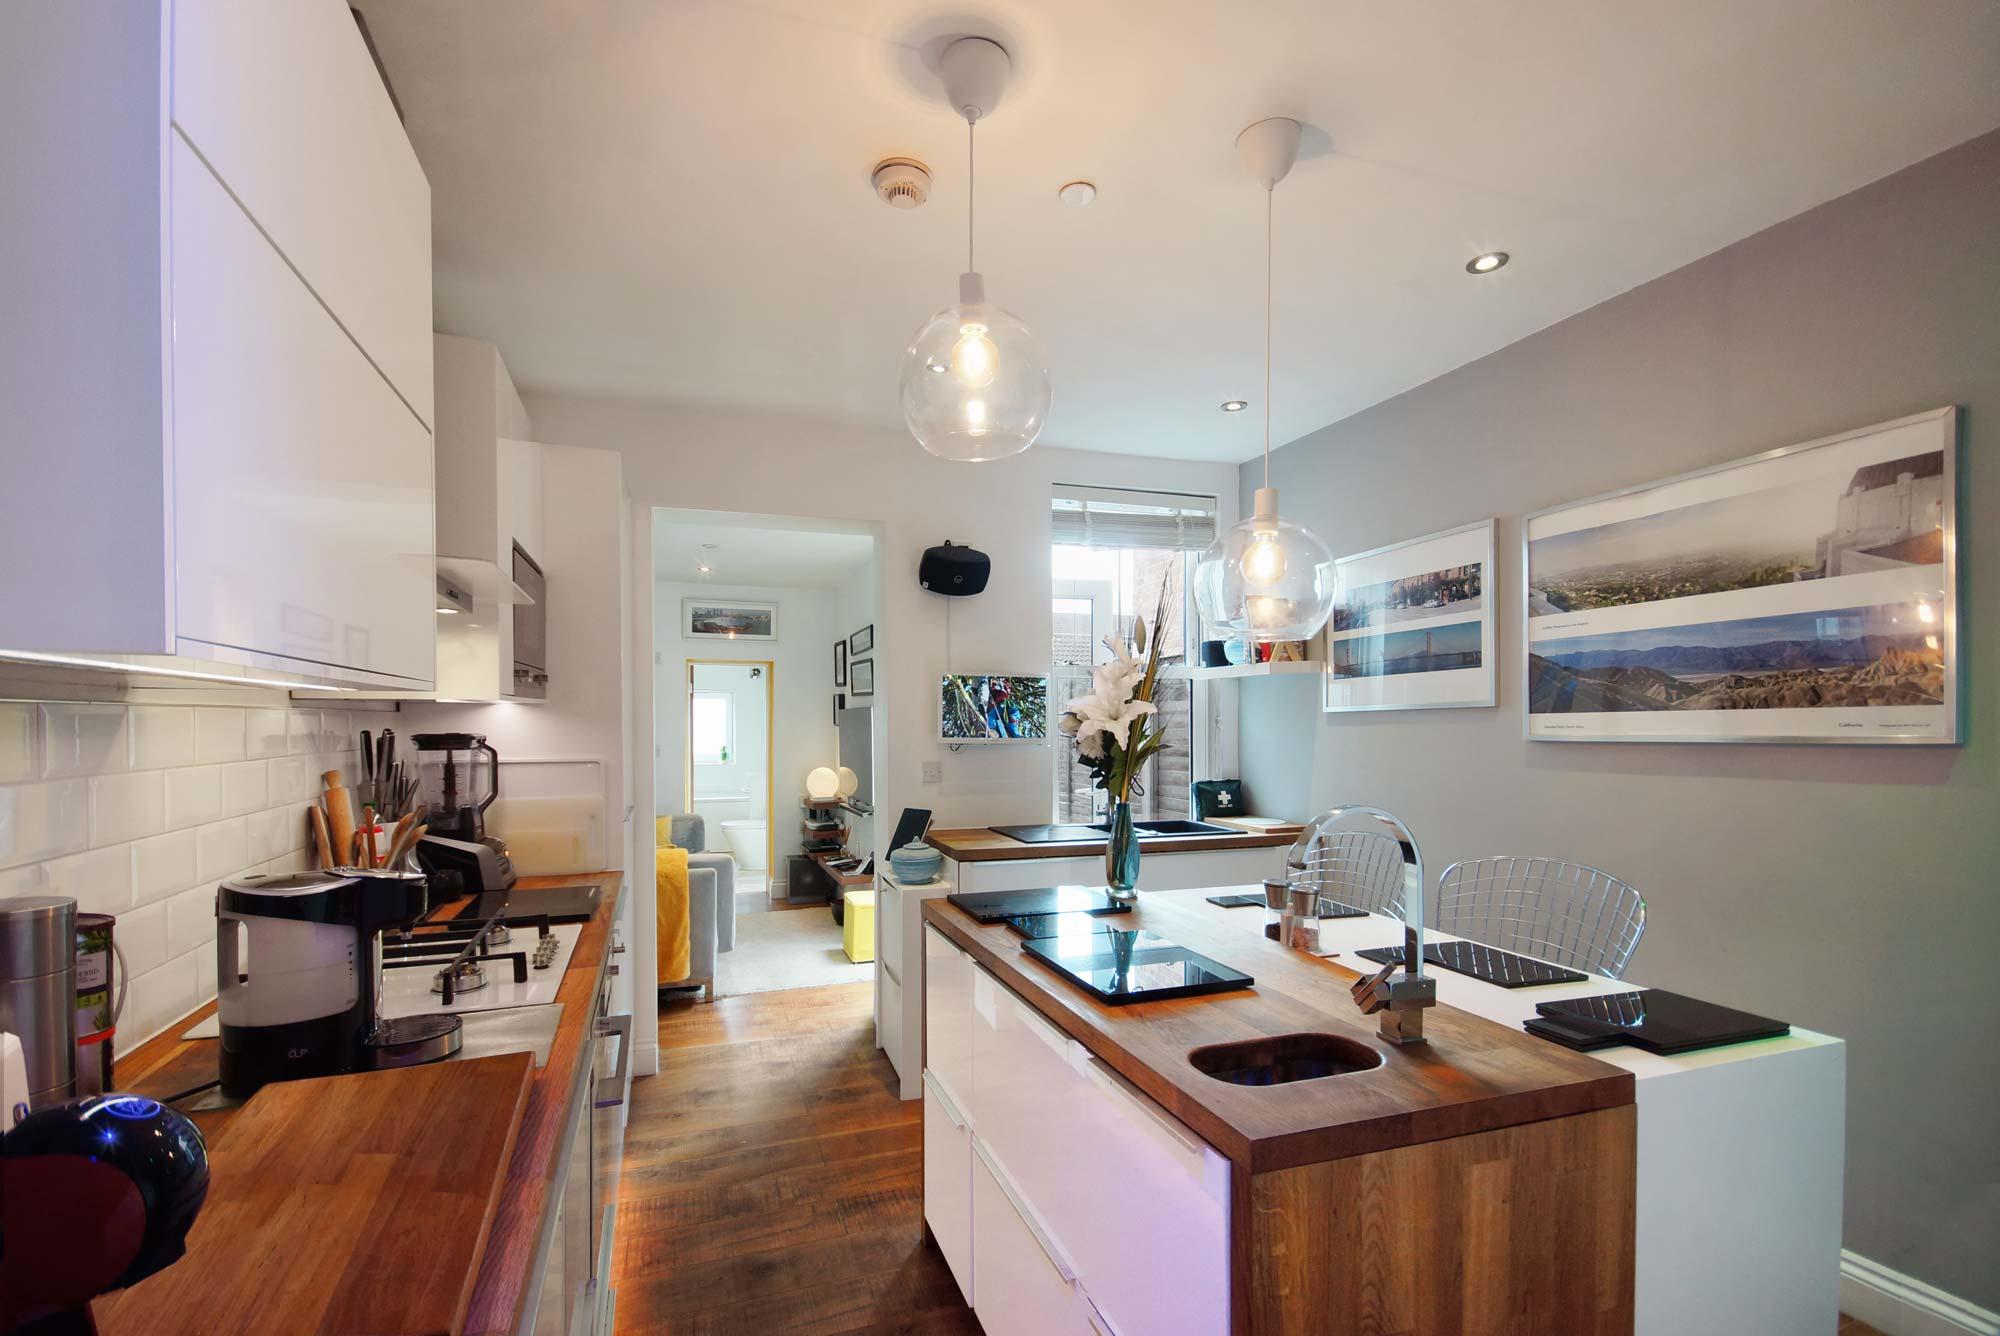 London Theatre Digs kitchen island